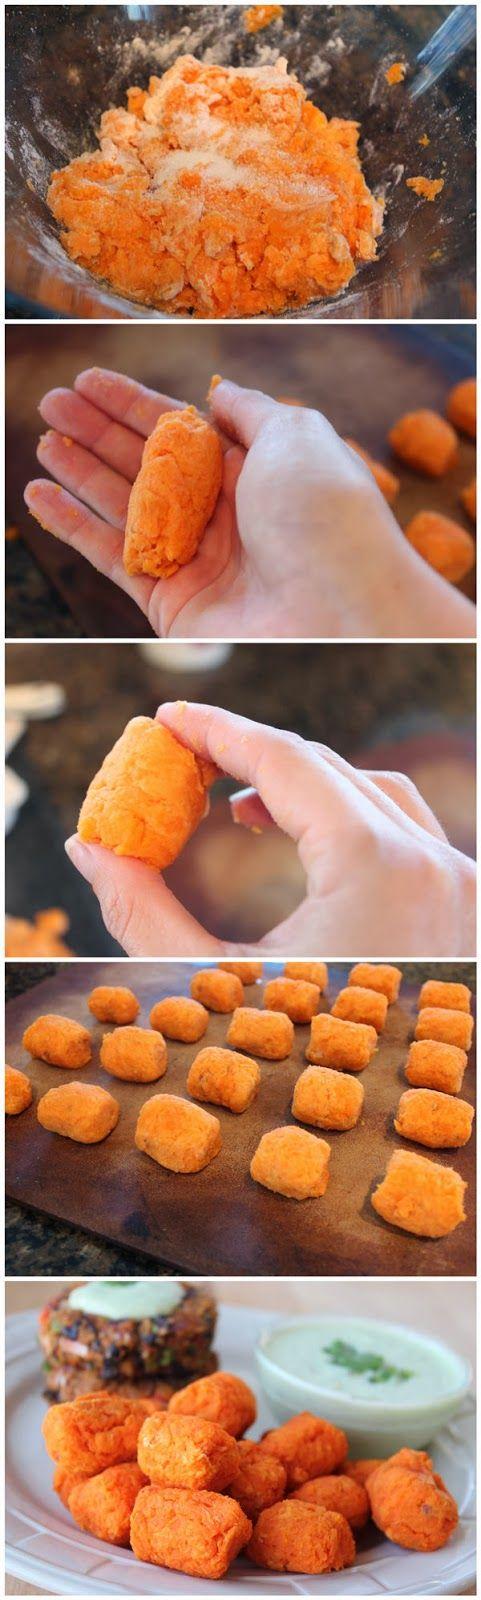 Homemade Baked Sweet Potato Tots ~ toprecipeblog